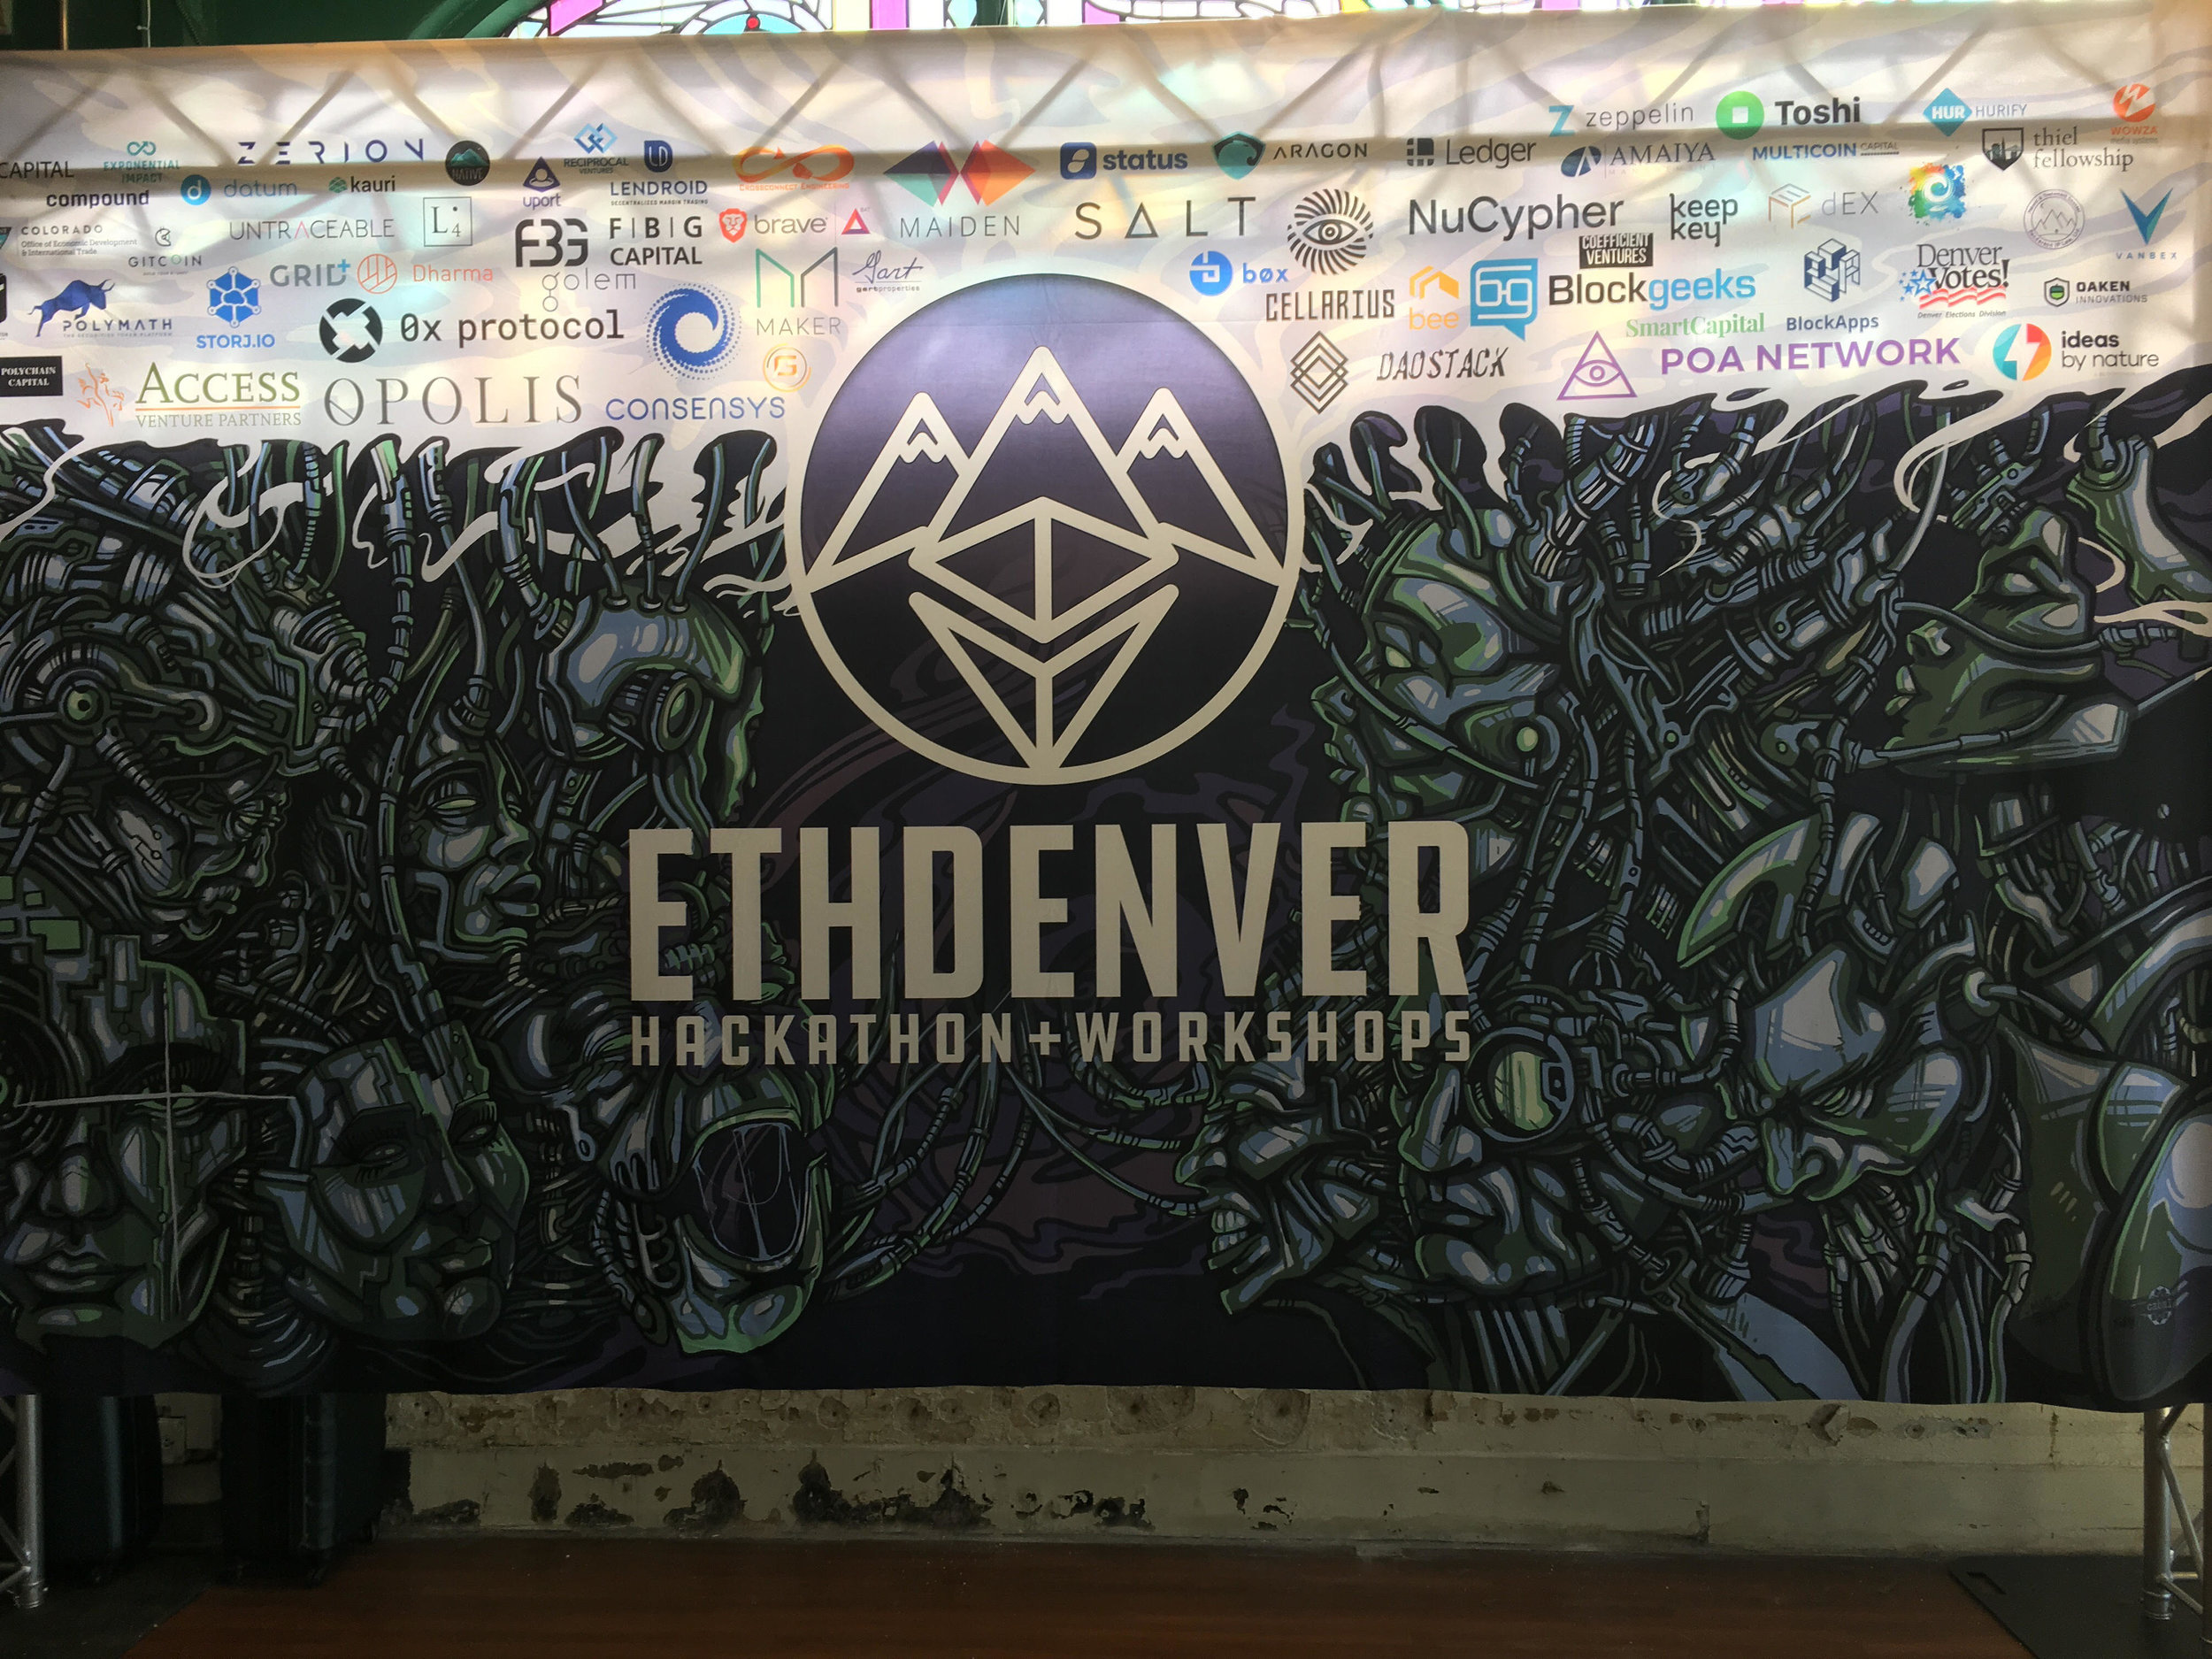 Figure 1. ETHDenver Hackathon, February 16 - 18, 2018